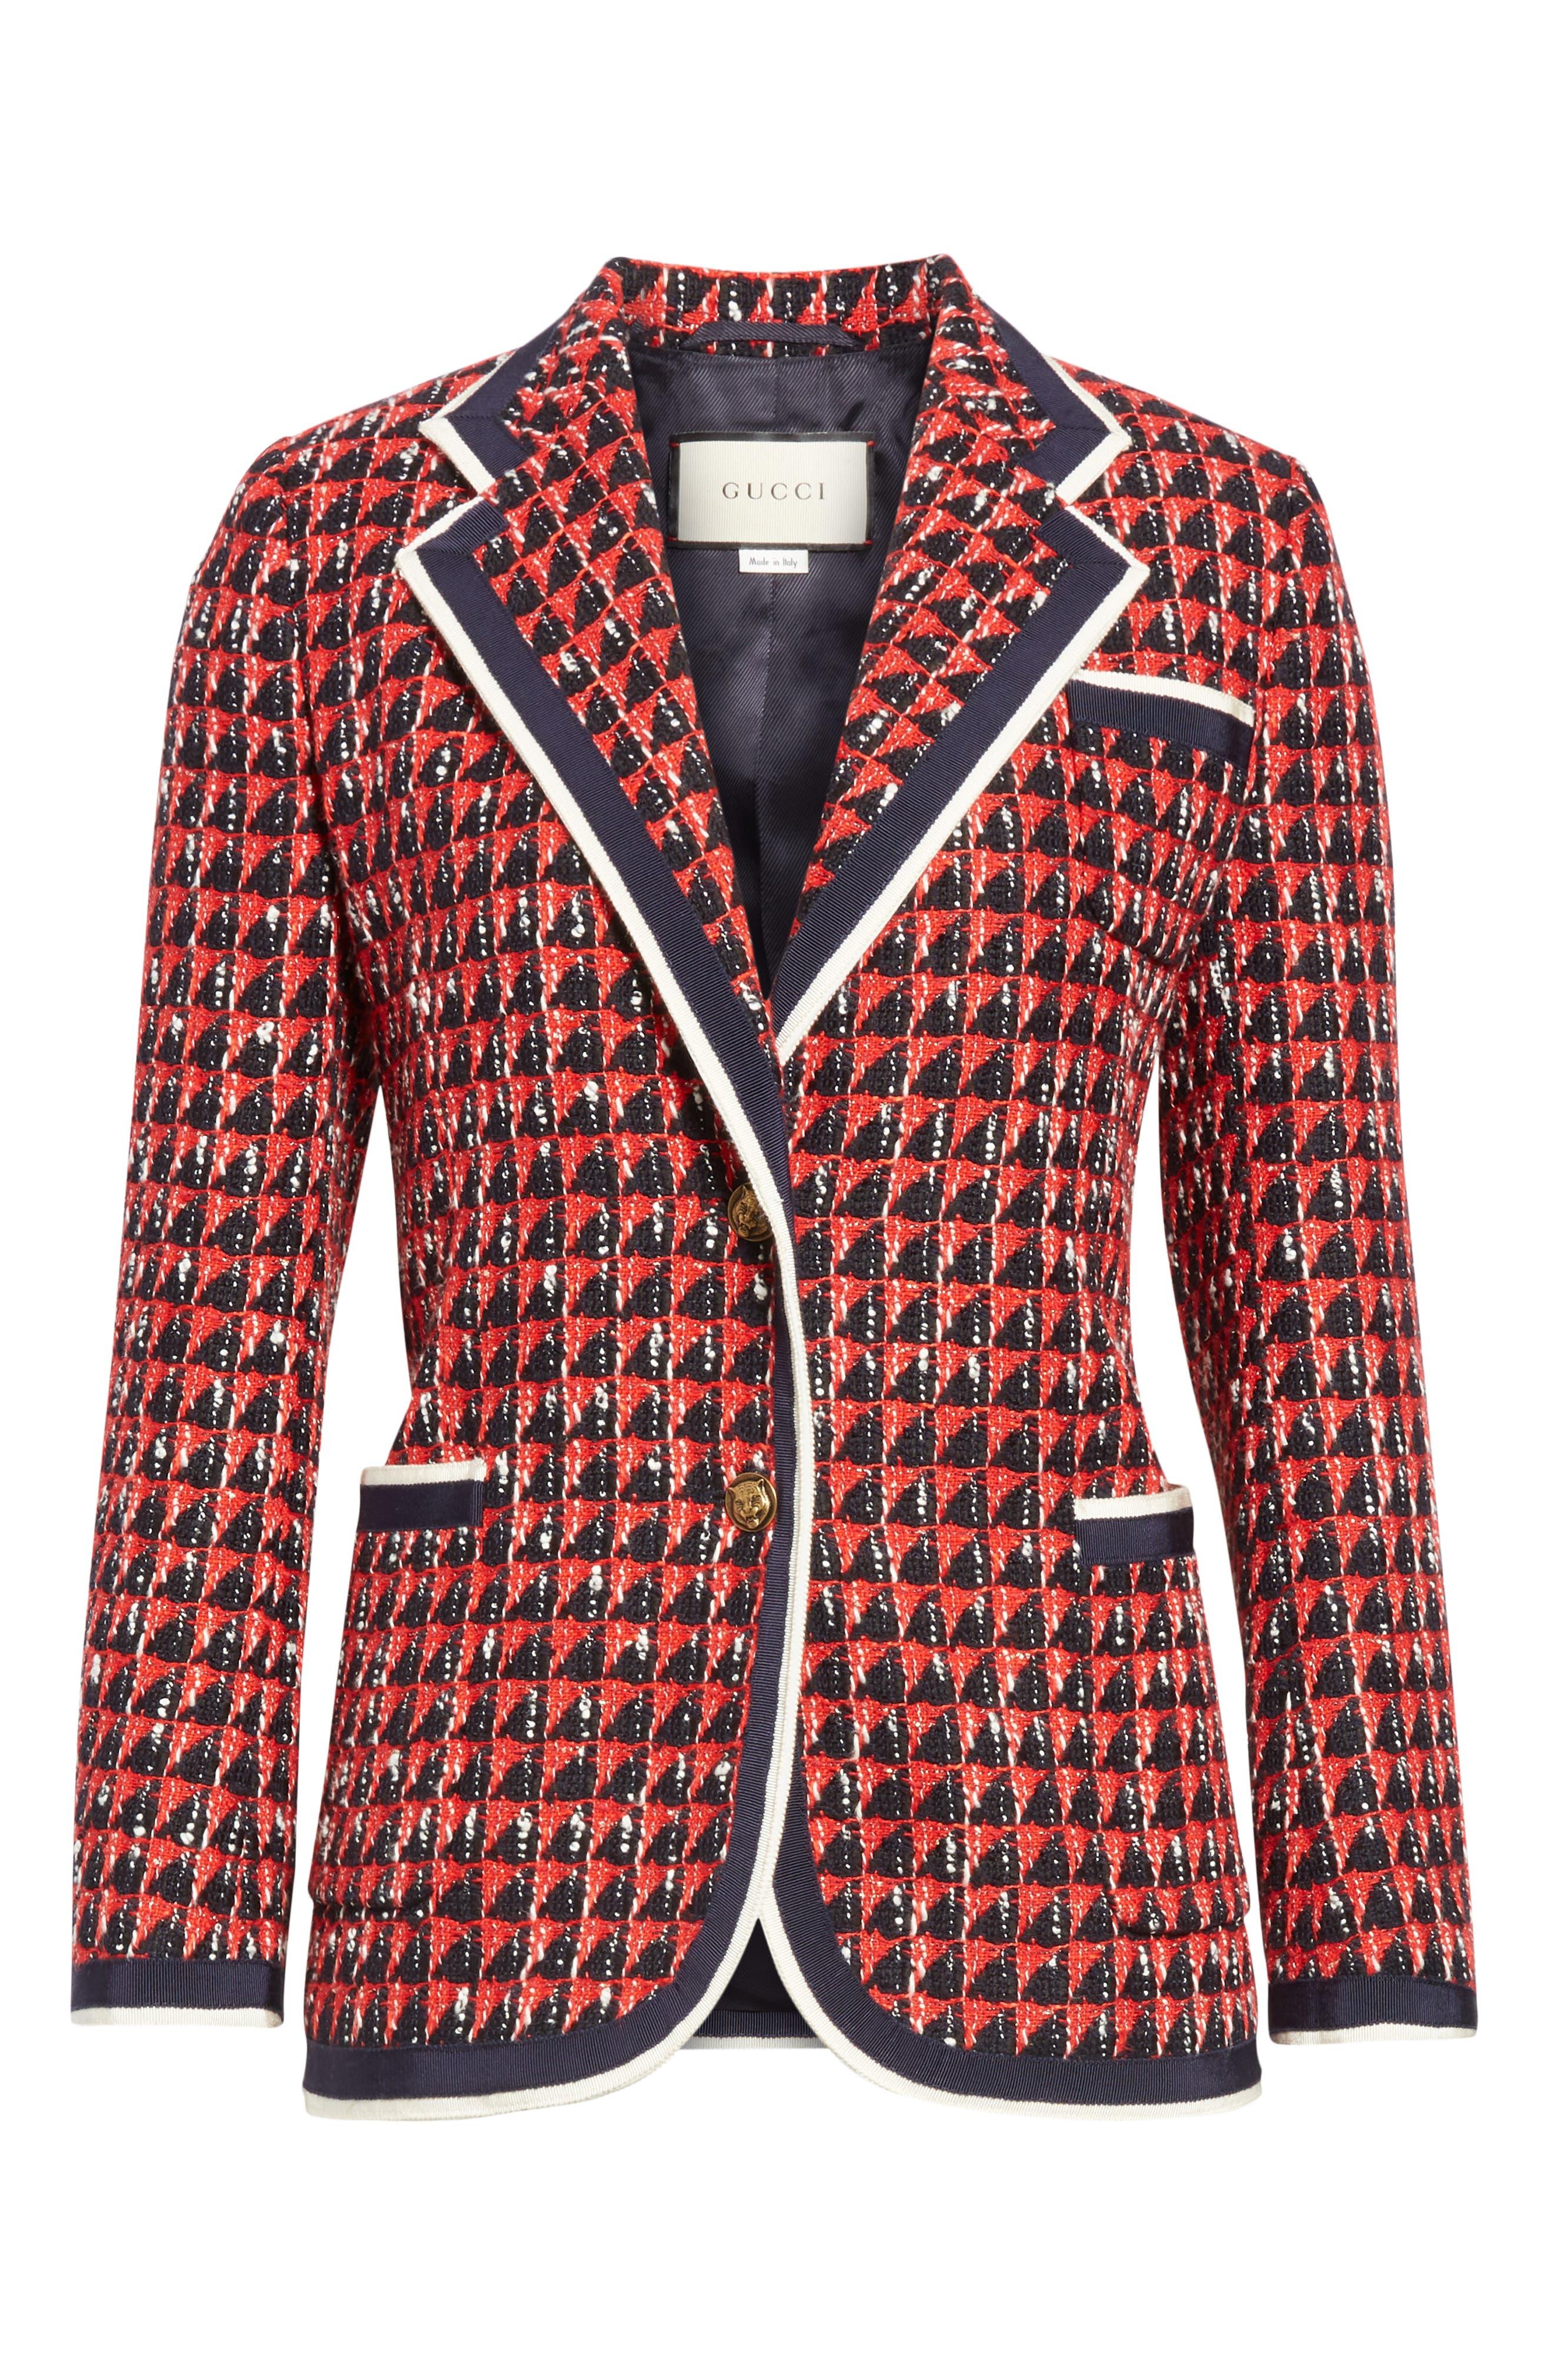 Geo Tweed Jacket,                             Alternate thumbnail 3, color,                             1880 BLACK/ RED/ WHITE